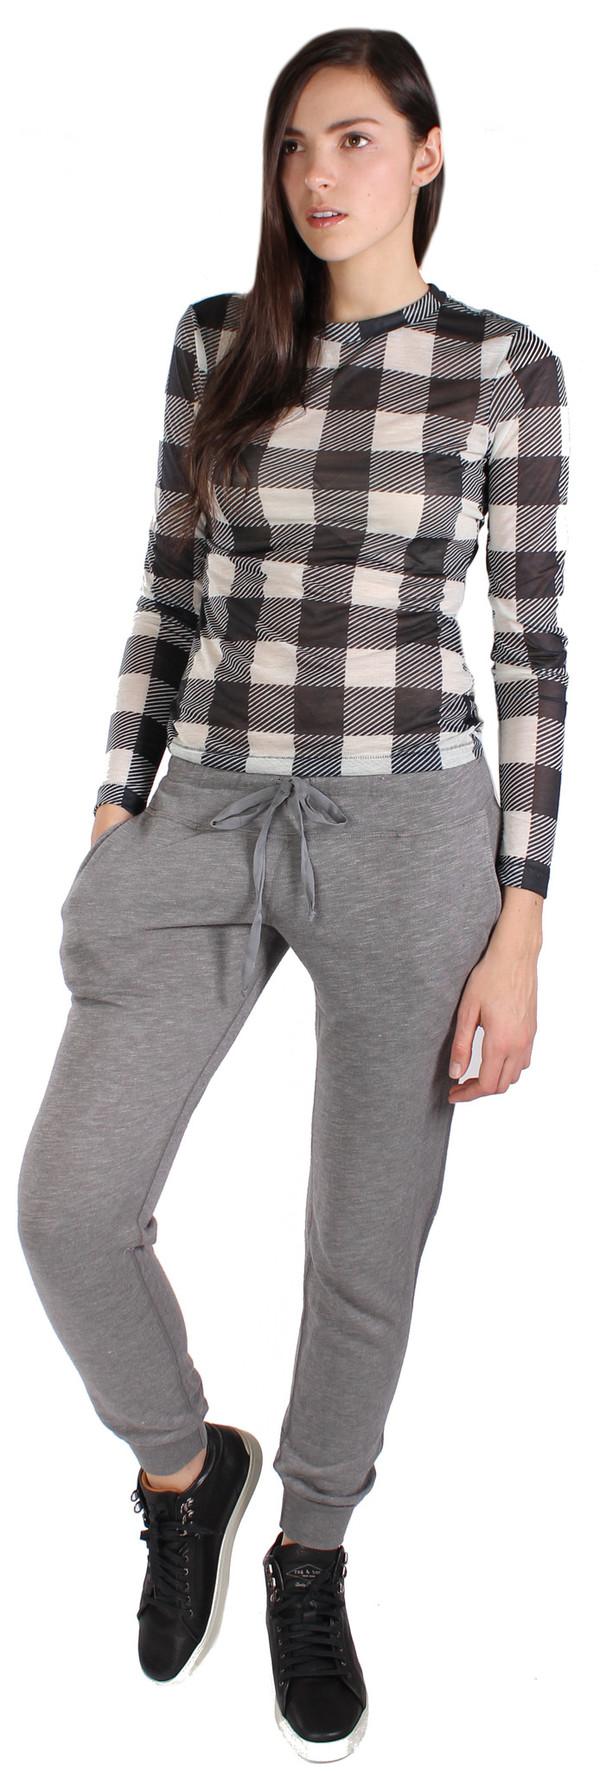 Clu Sweat Pants with Yoke